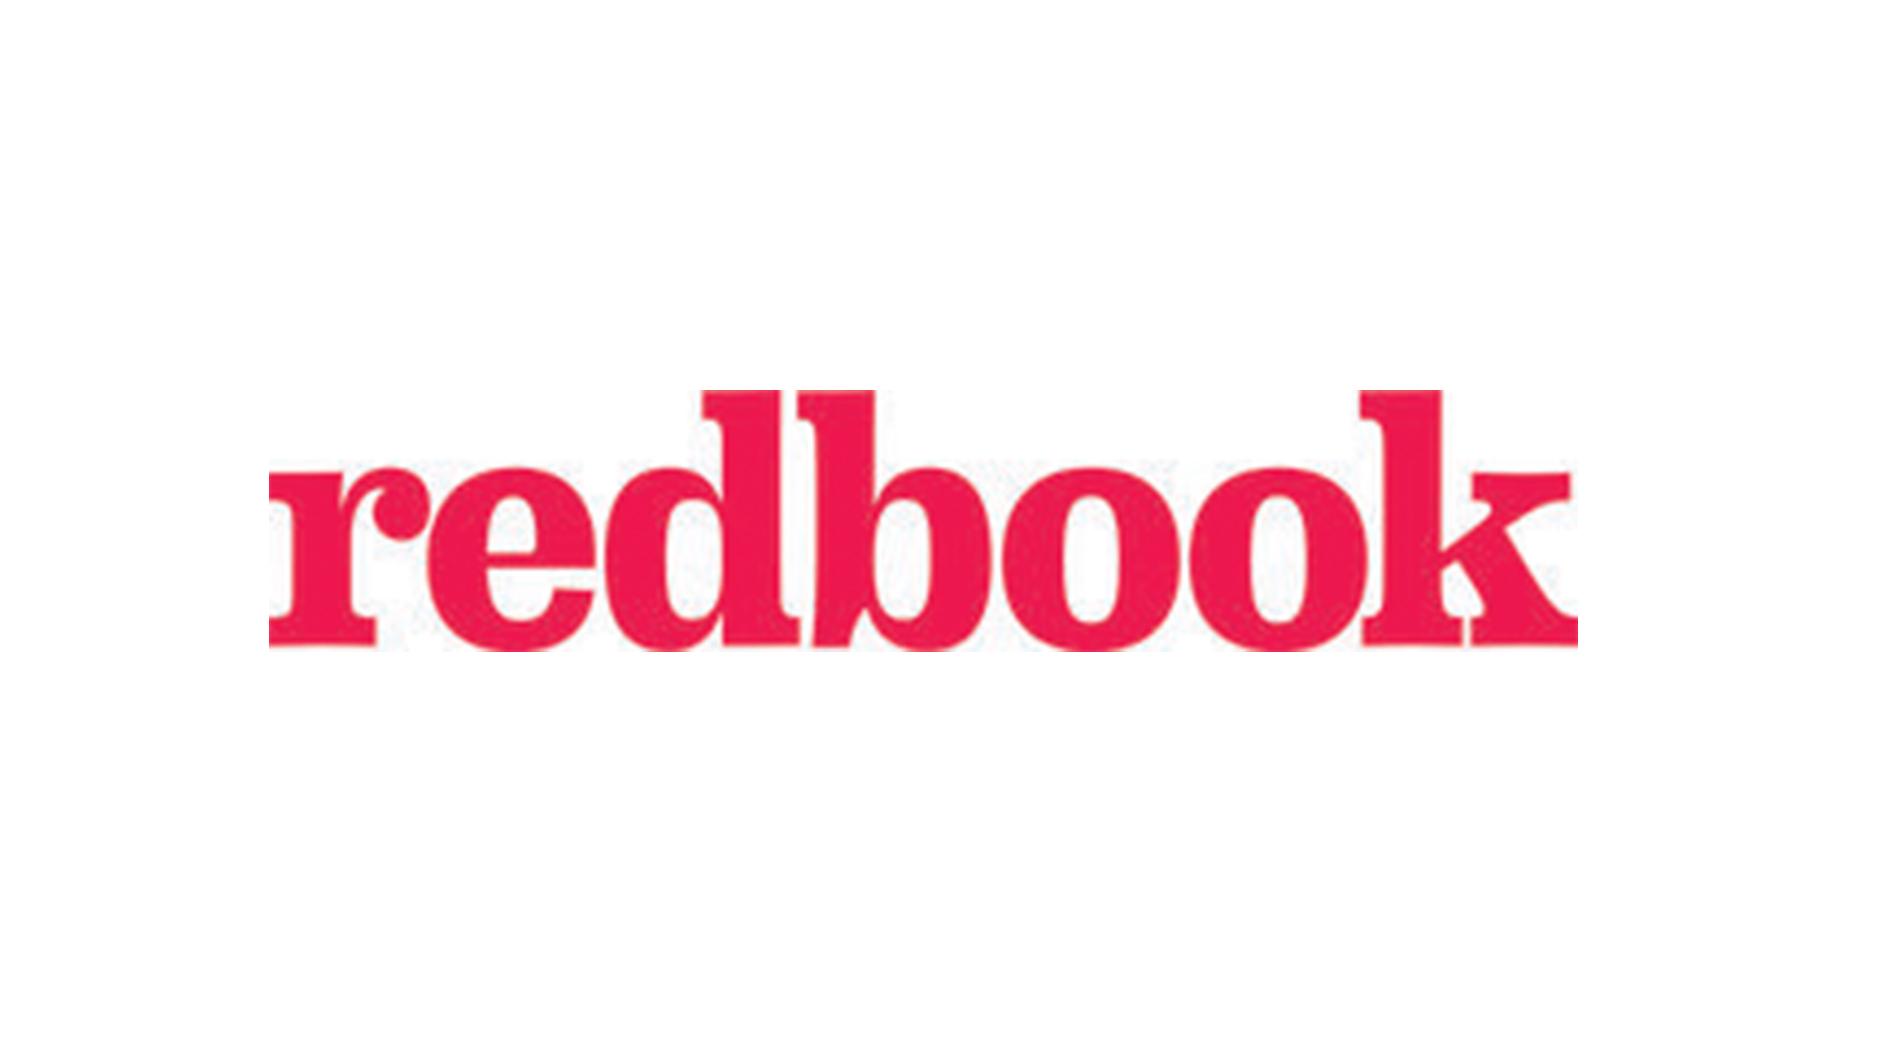 redbook.jpg